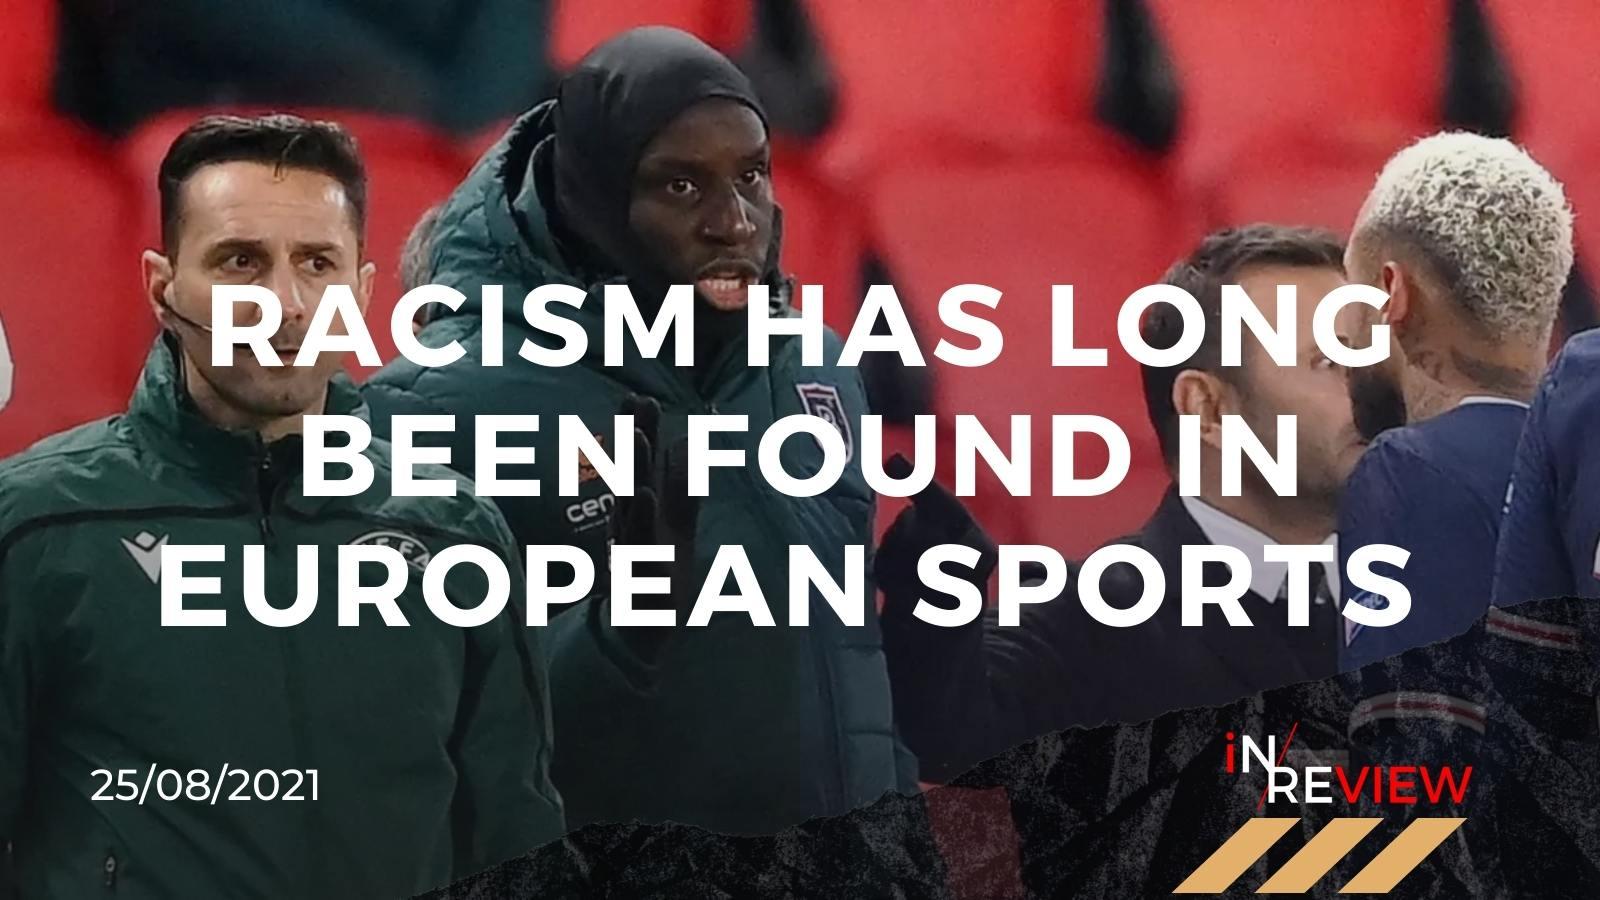 Racism in football - euro 2020 - FA -England - Marcus Rashford - Raheem Sterling - Sport - European Sports - Kick it out - social media platforms - football fans